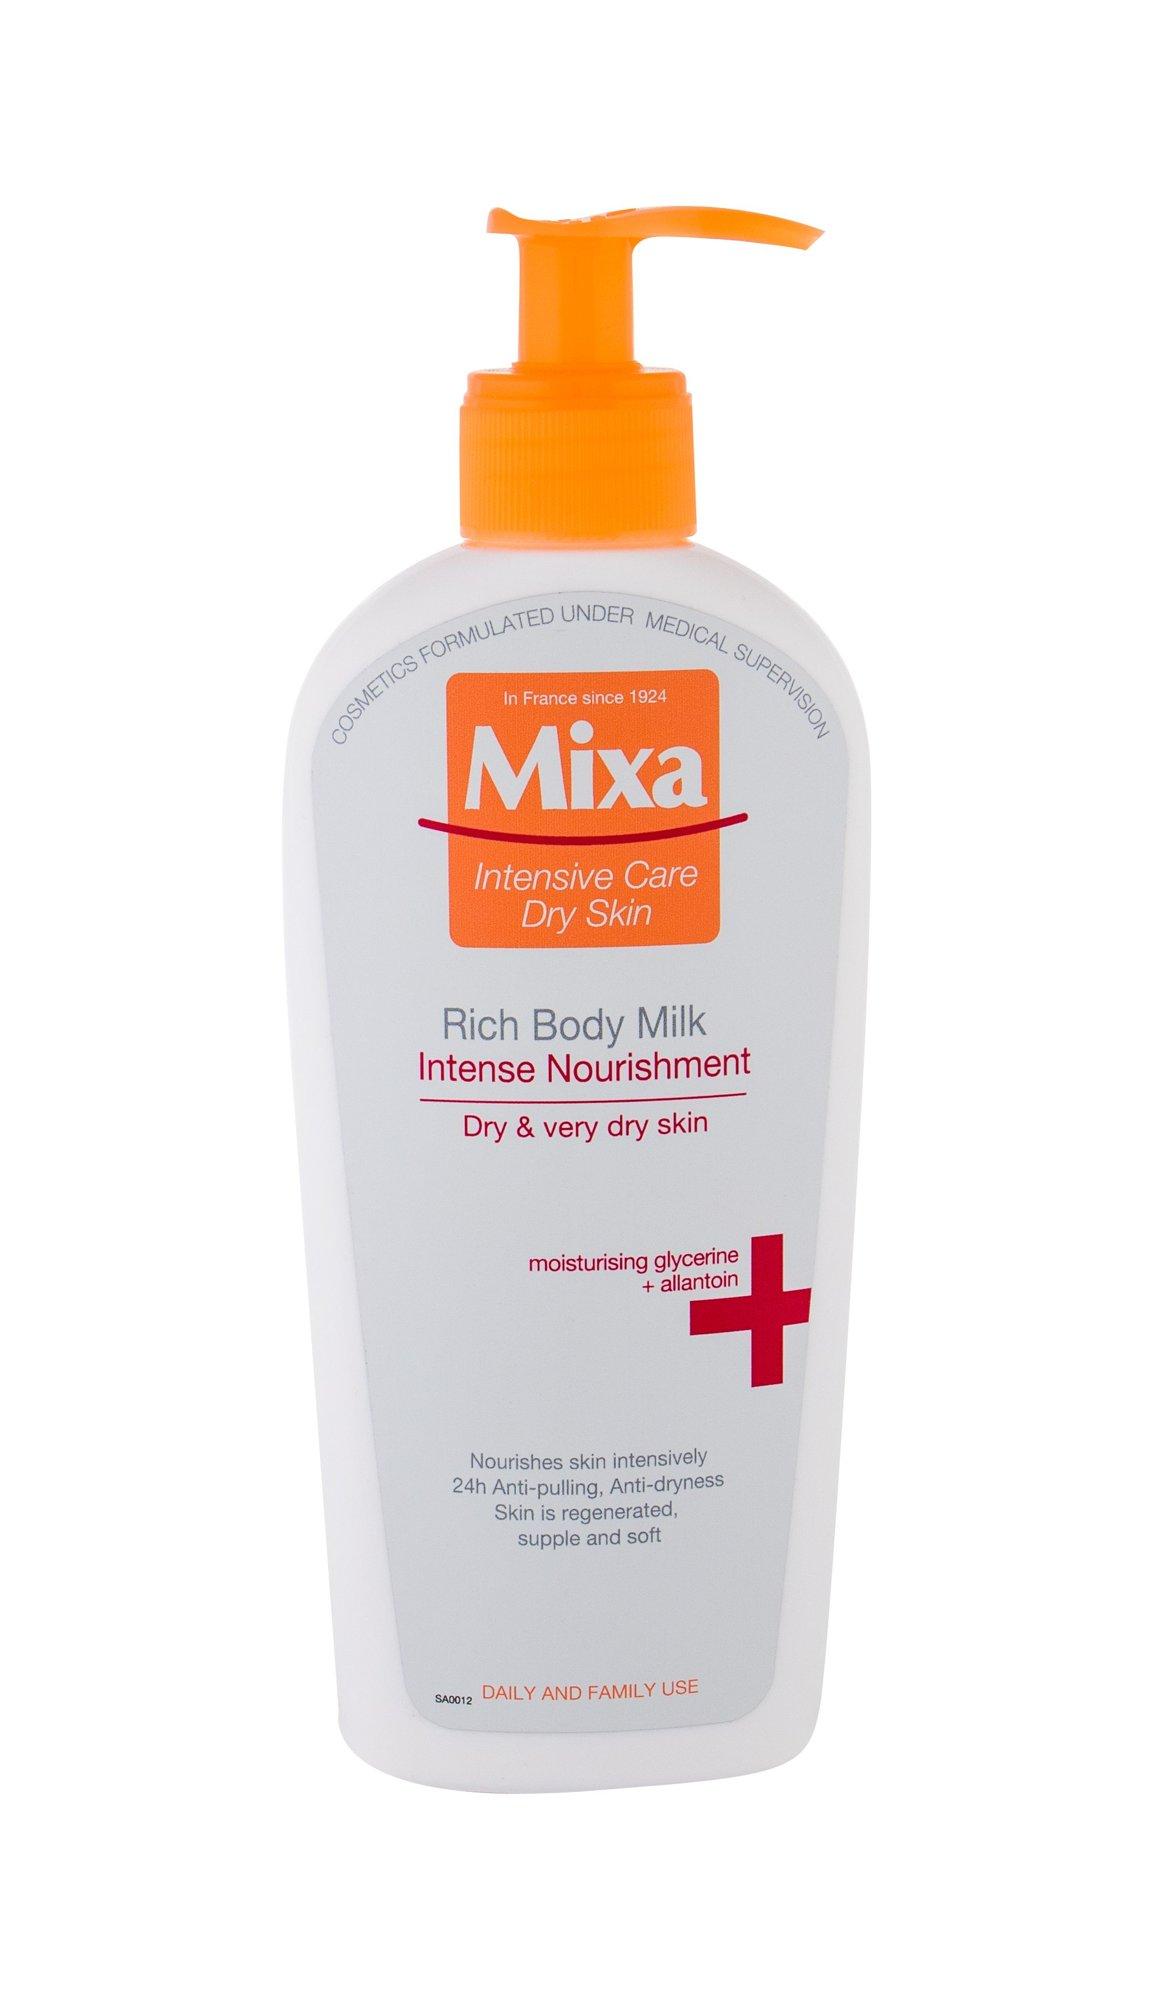 Mixa Intense Nourishment Body Lotion 250ml